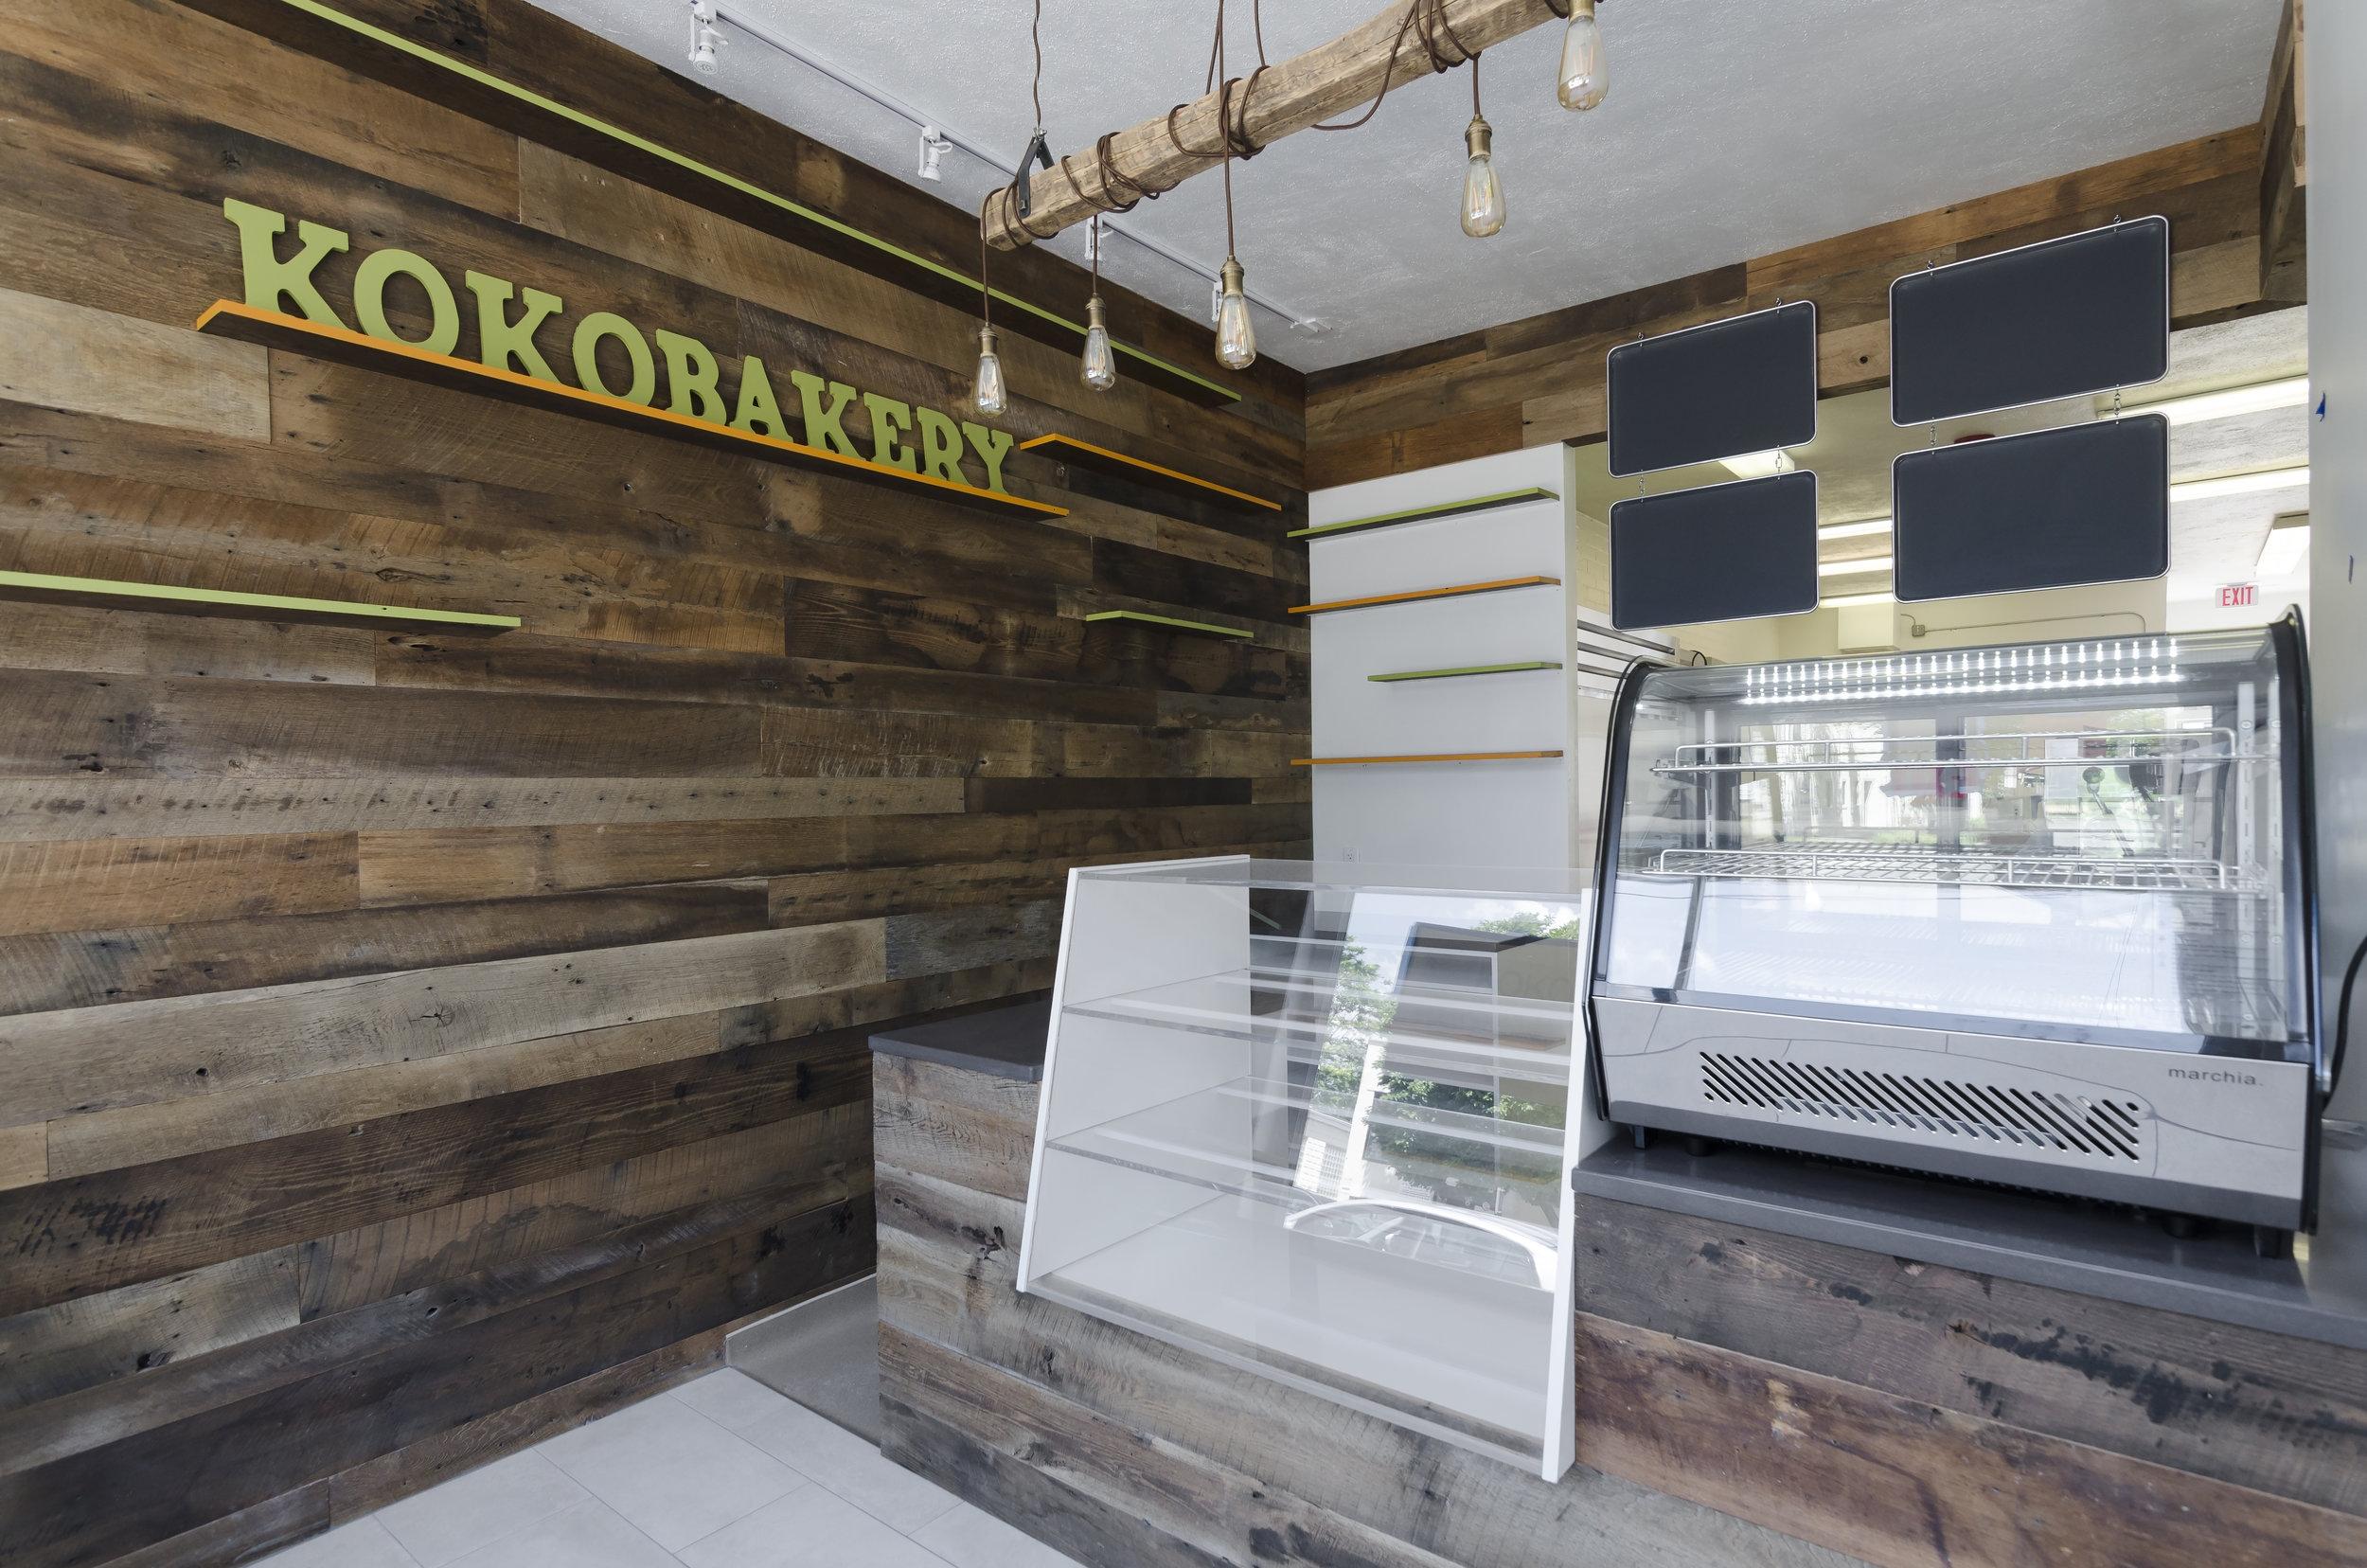 Koko Bakery, Newton MA